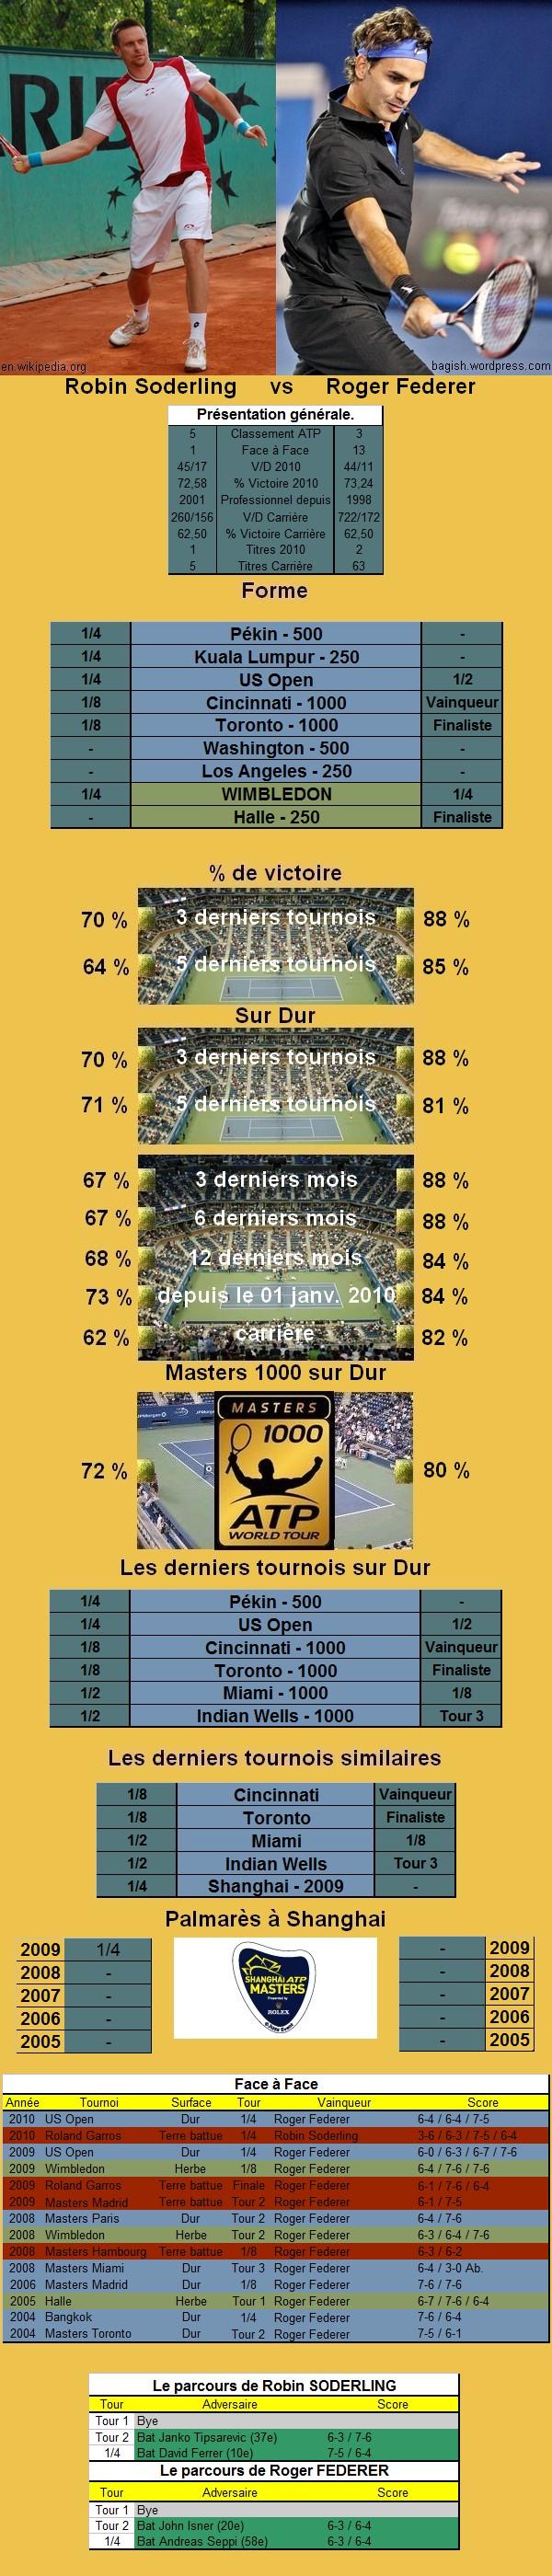 Statistiques tennis de Soderling contre Federer à Shanghai